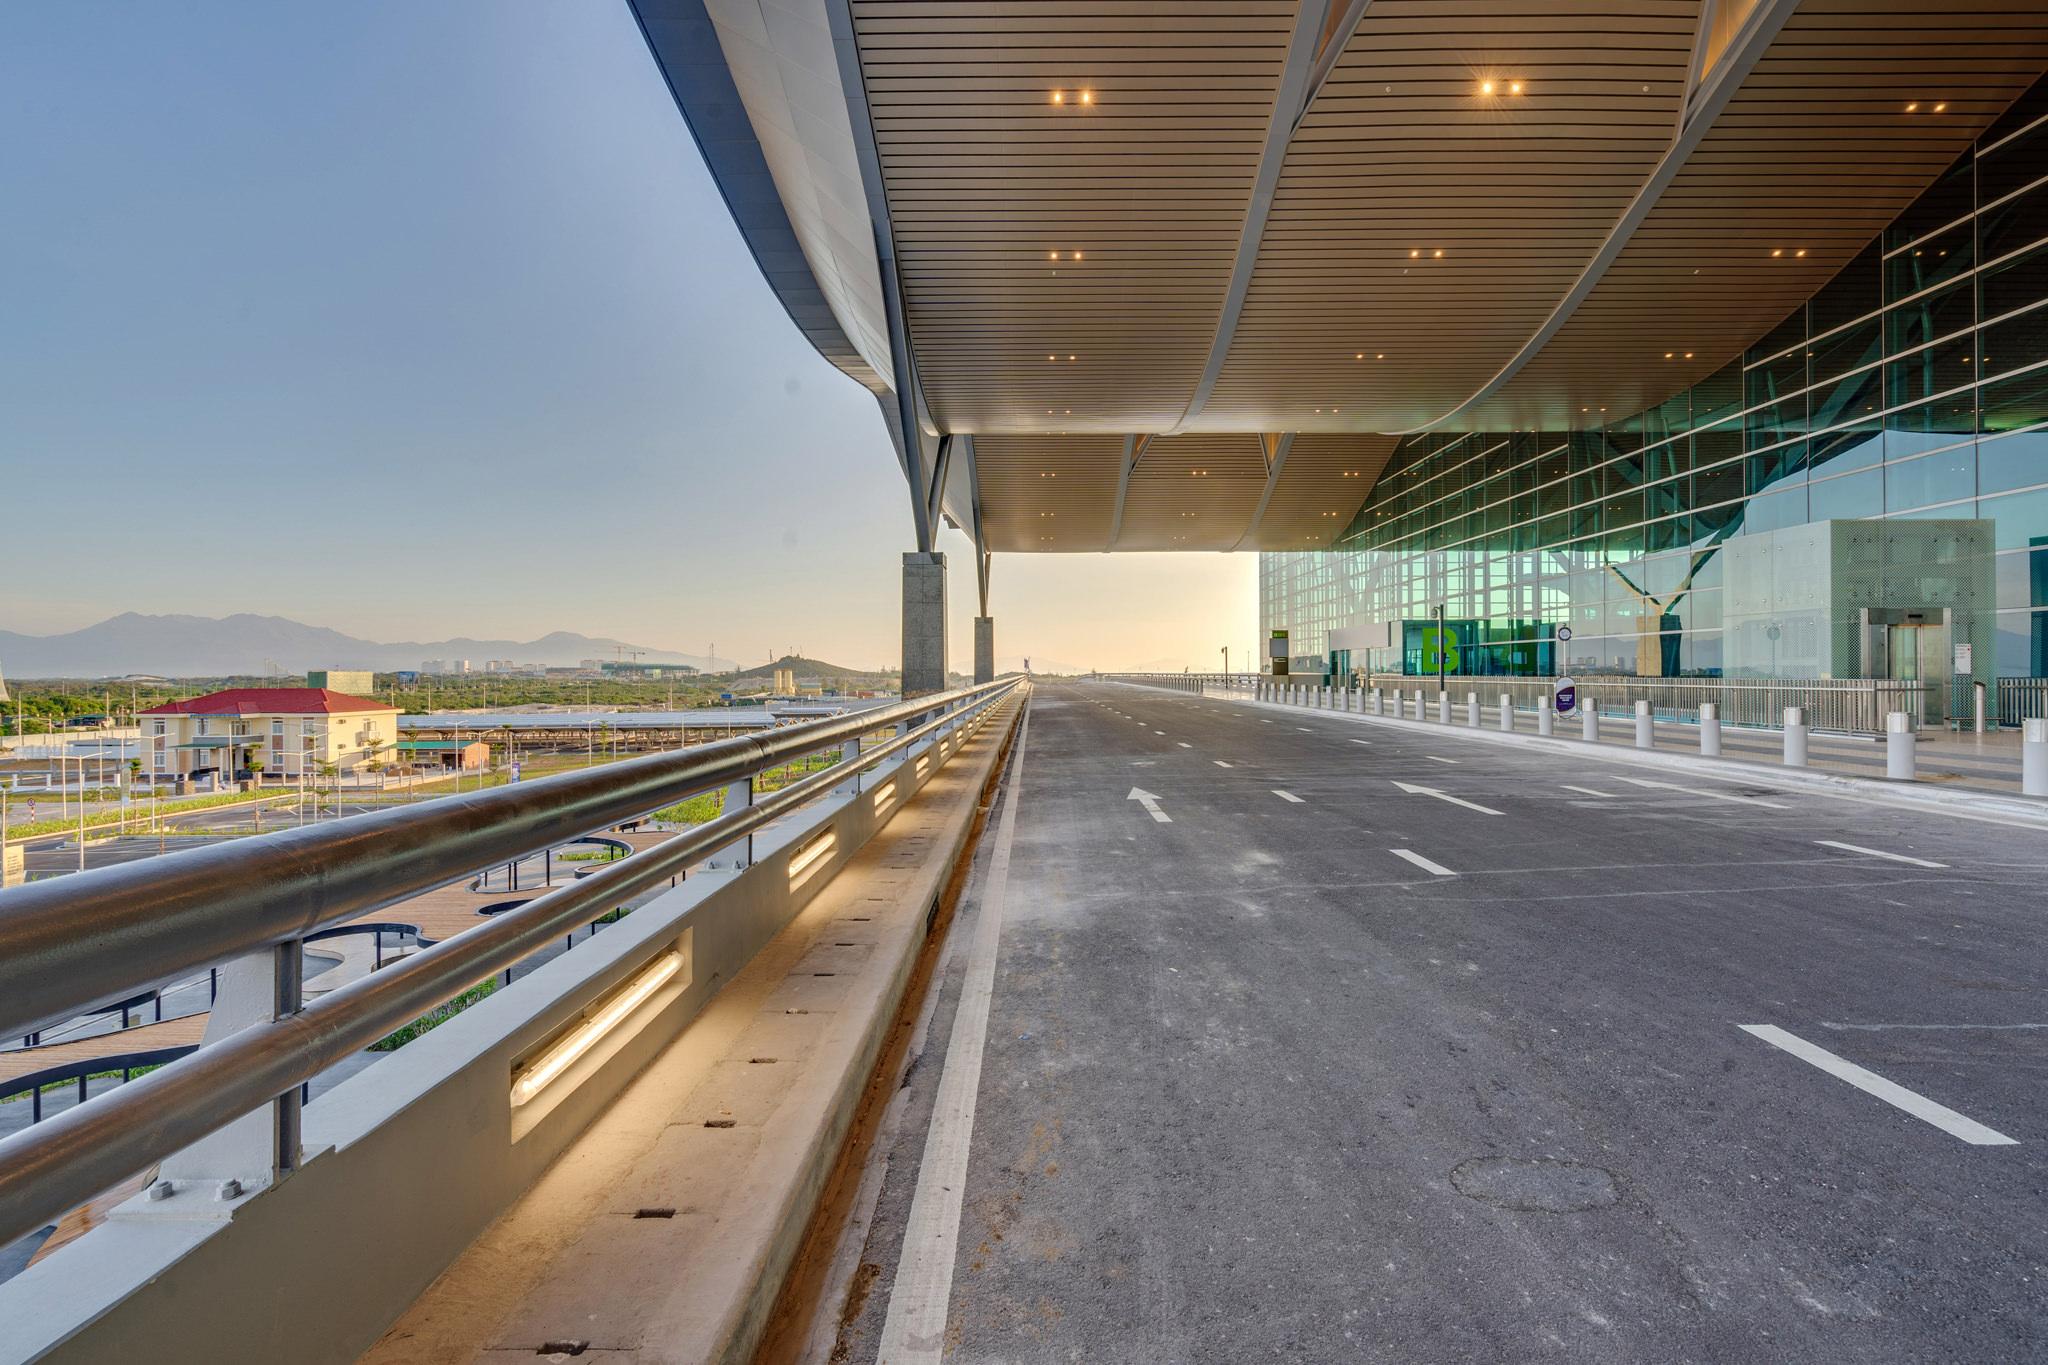 20180626 - Cam Ranh Airport - Architecture - 0061.jpg